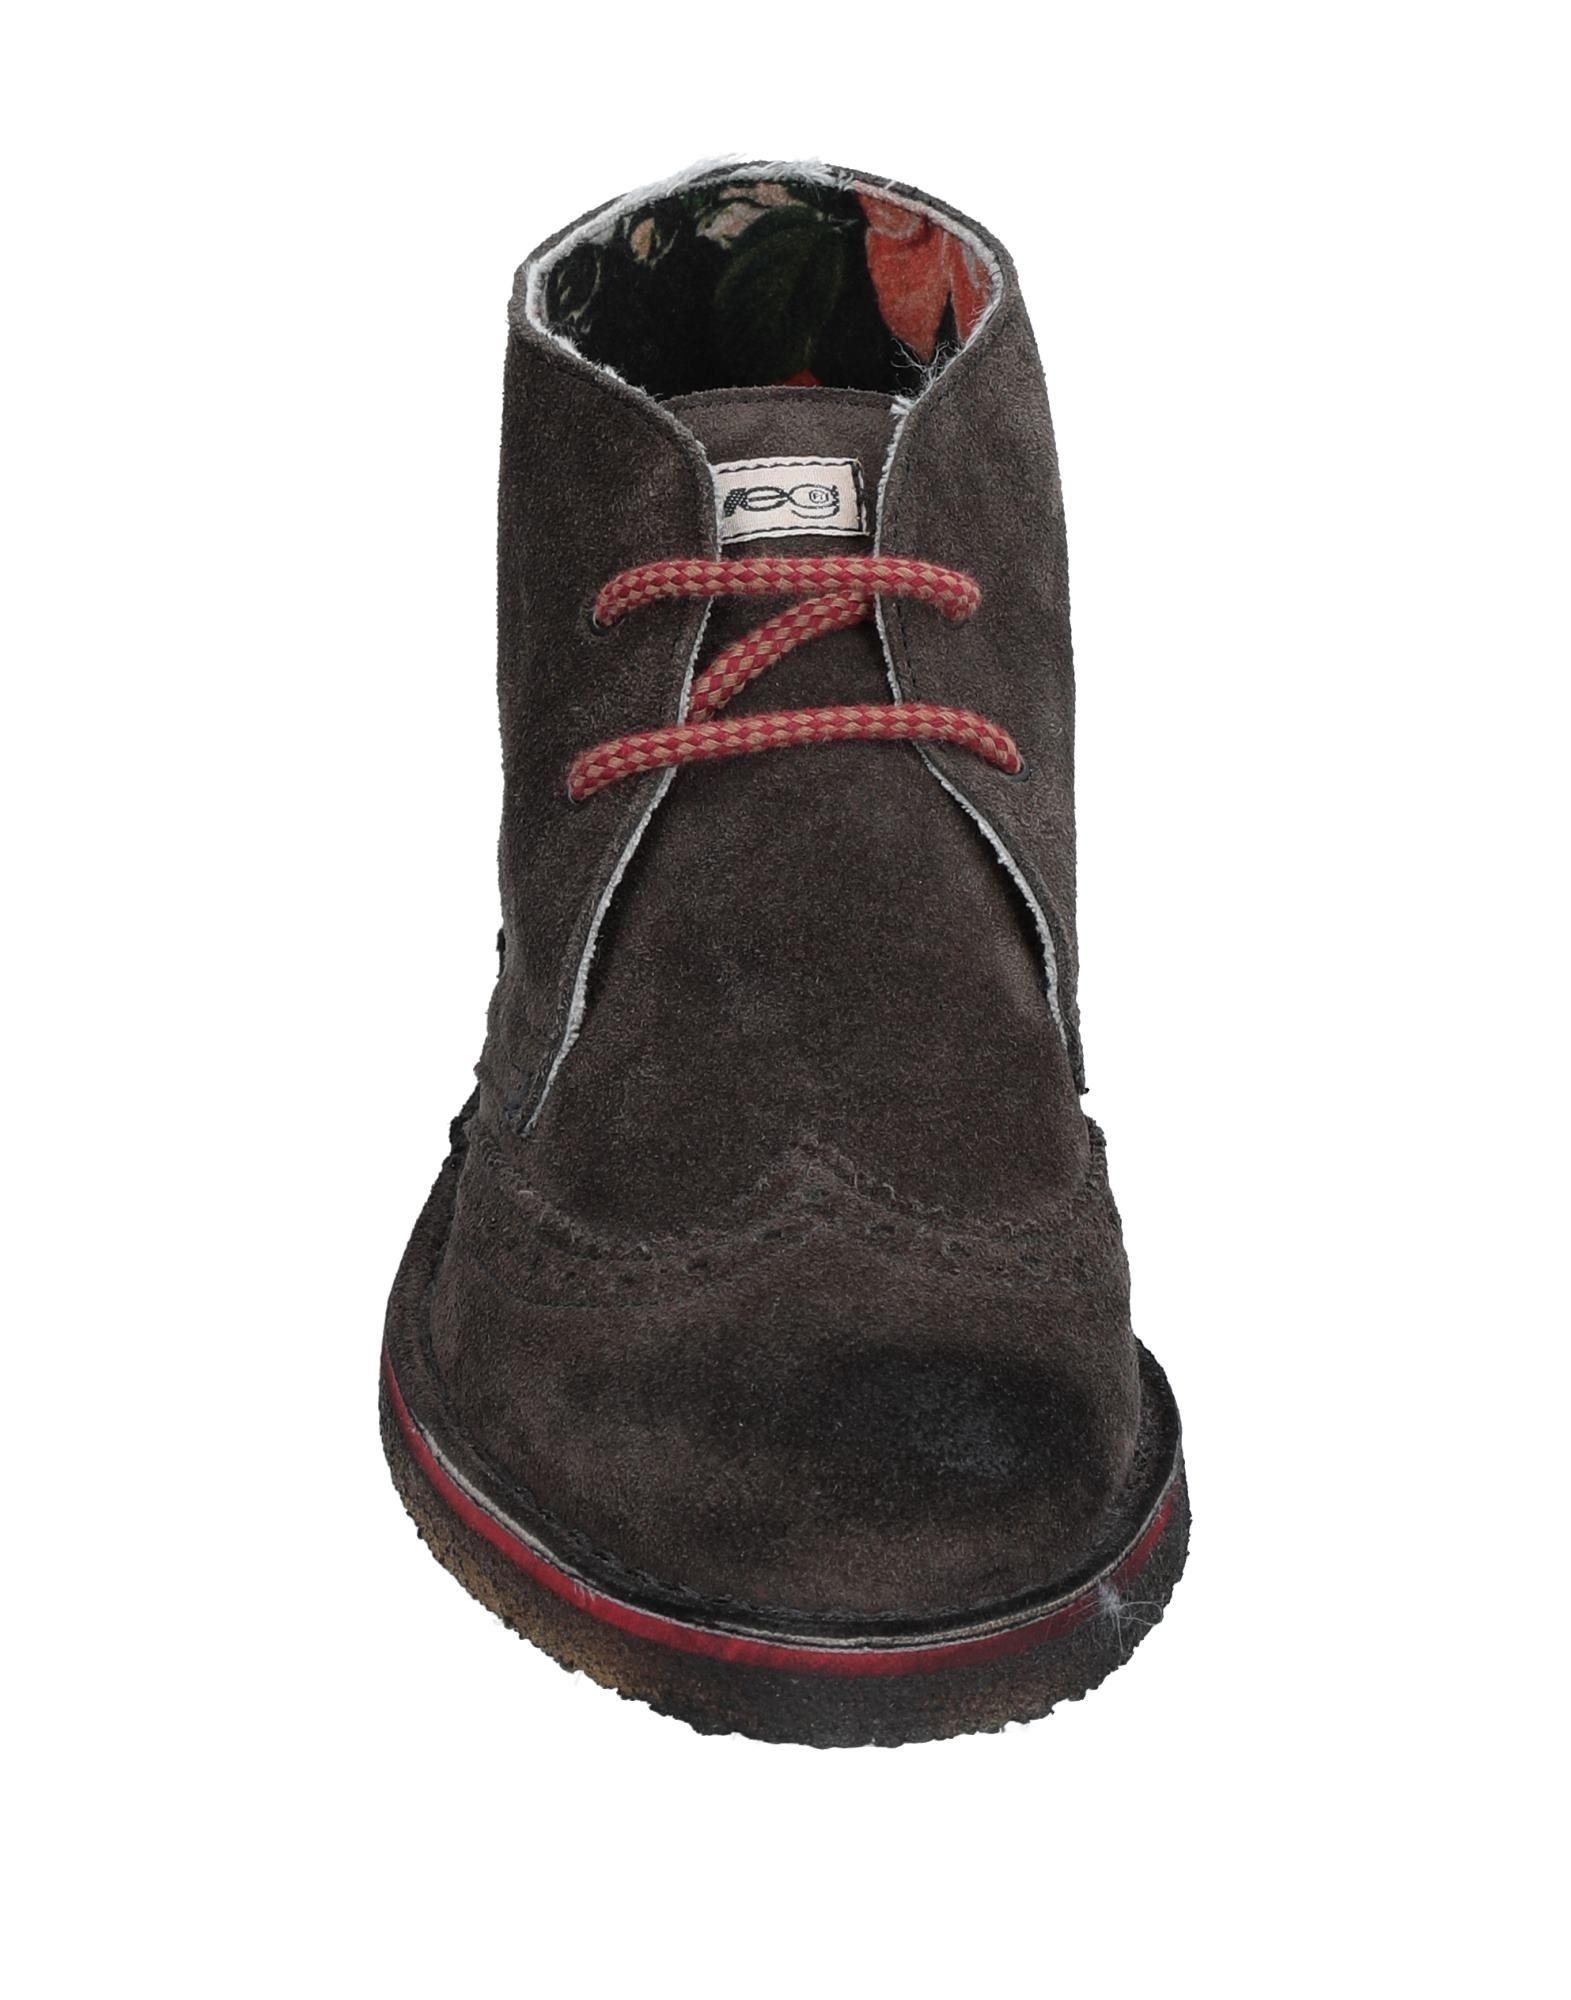 Rabatt echte Schuhe 11530719KP Weg Stiefelette Herren  11530719KP Schuhe 96939f